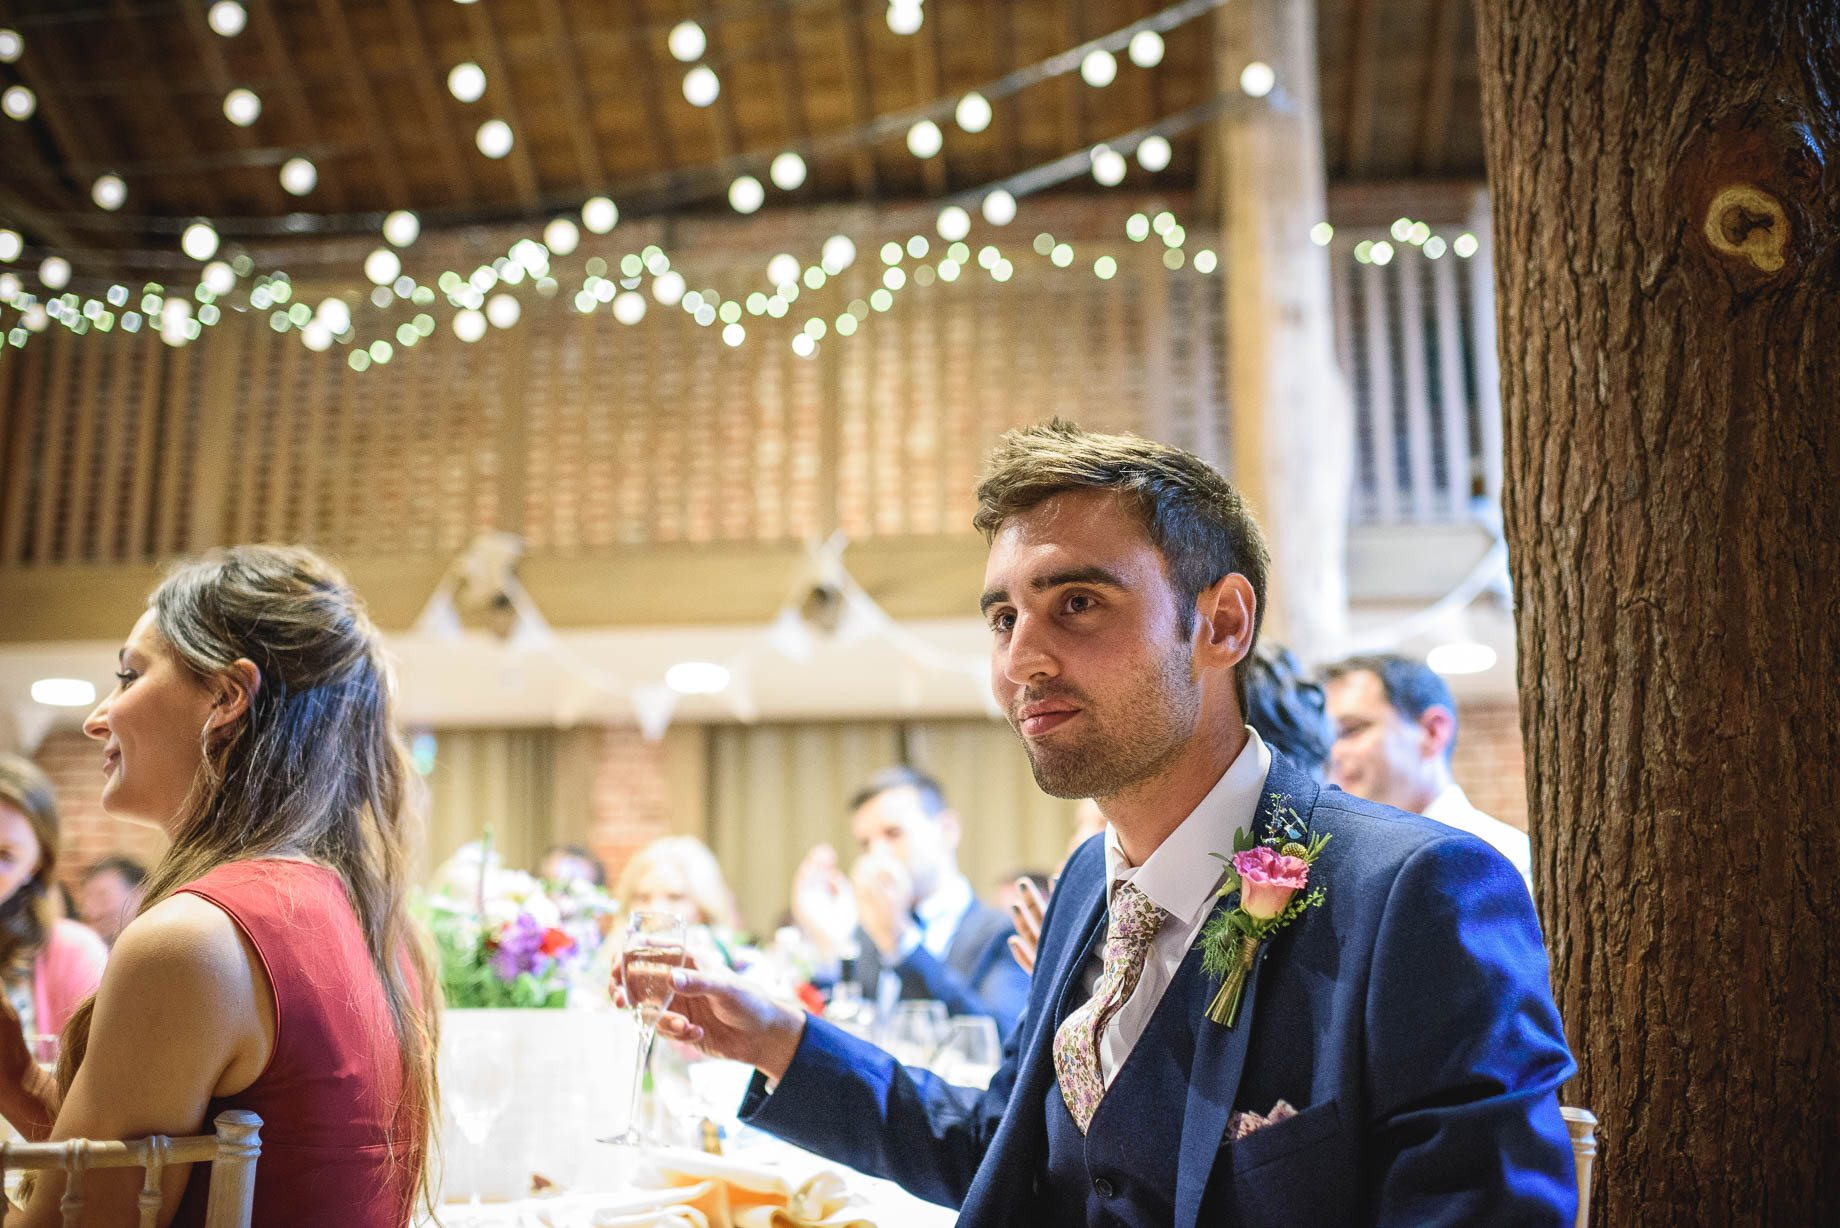 Gaynes Park wedding photography - Guy Collier Photography - Rachel and Jon (131 of 169)